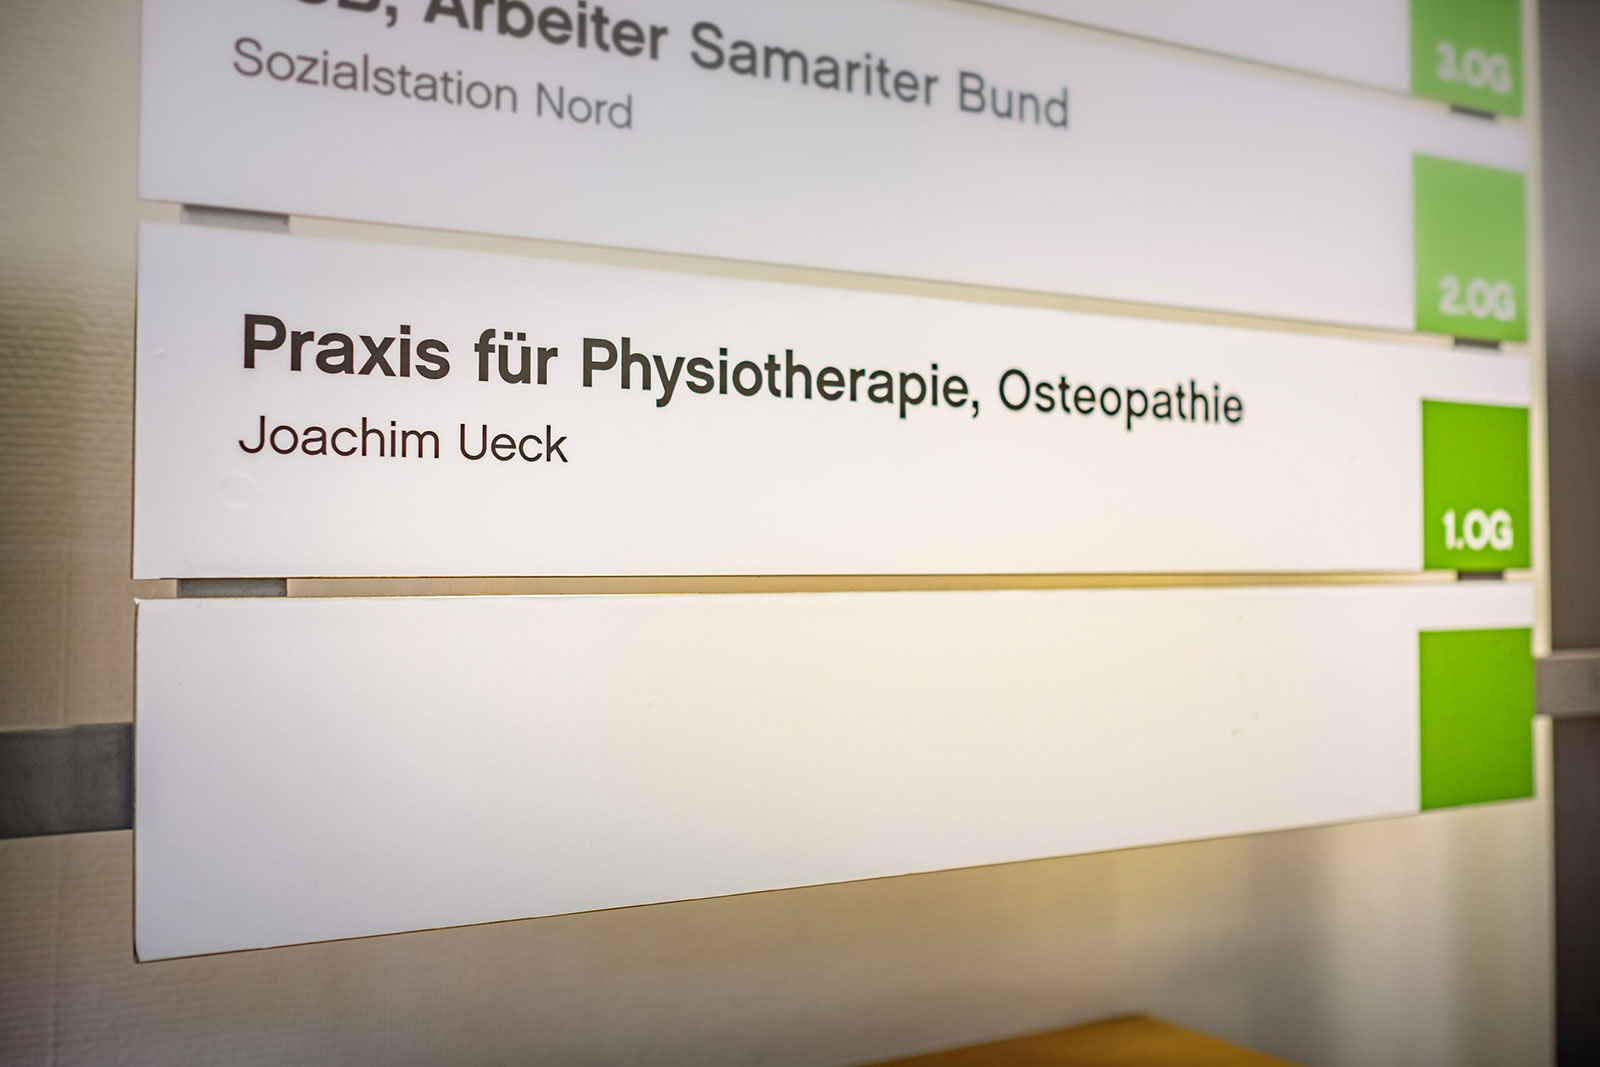 Praxisschild Physiotherapie Ueck